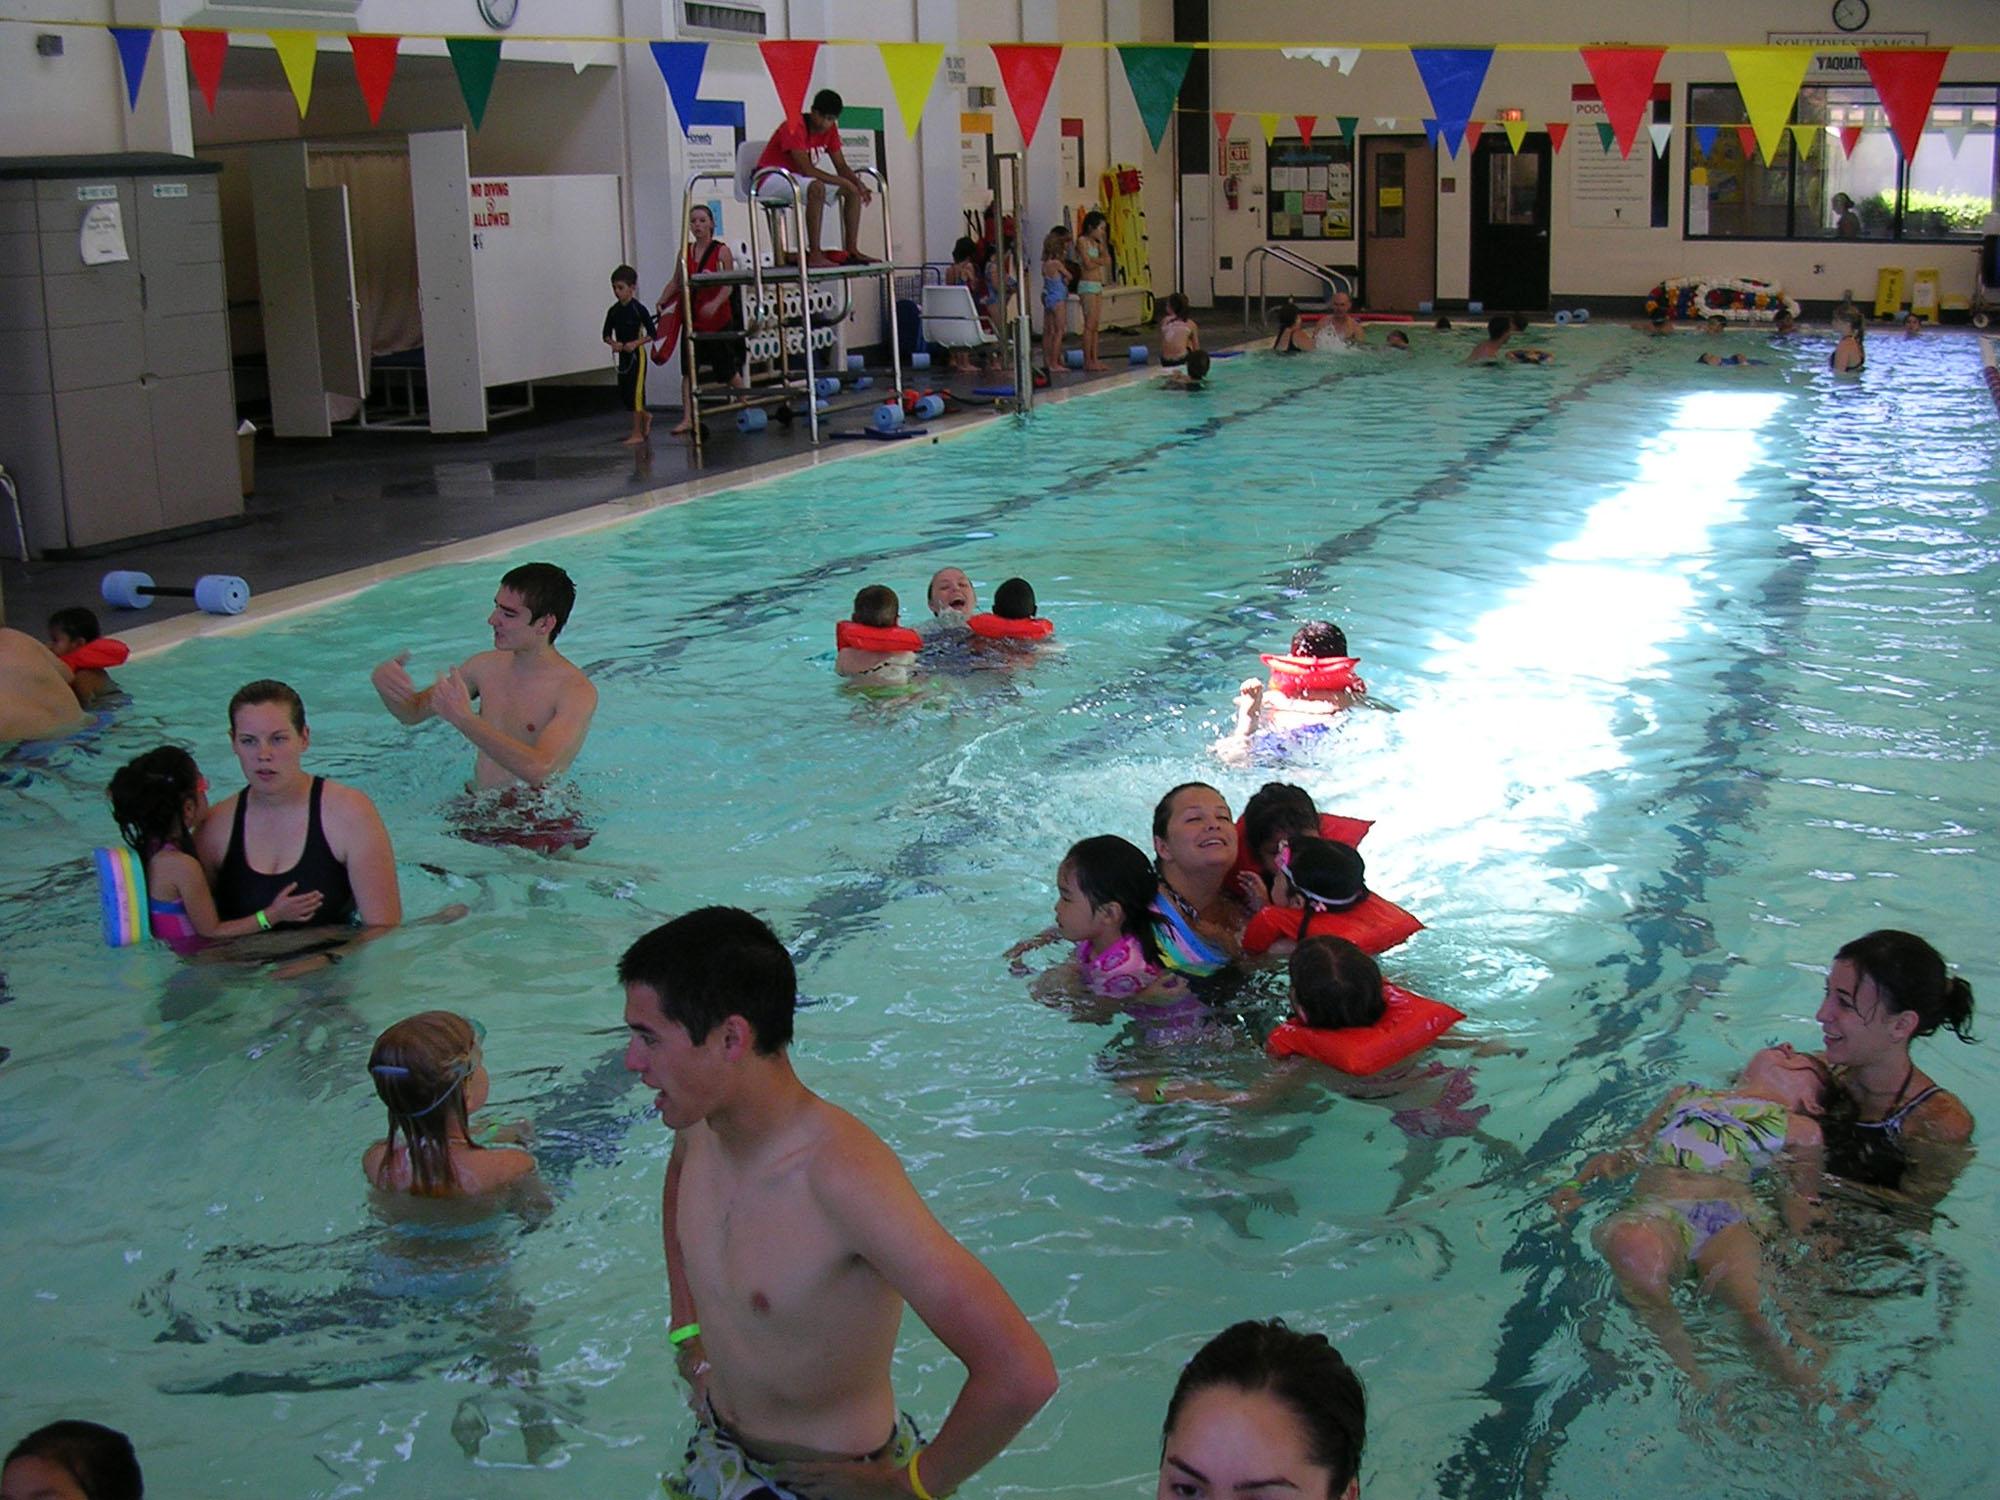 Making Pools Safer Aquatics International Magazine Safety Buildings And Facilities